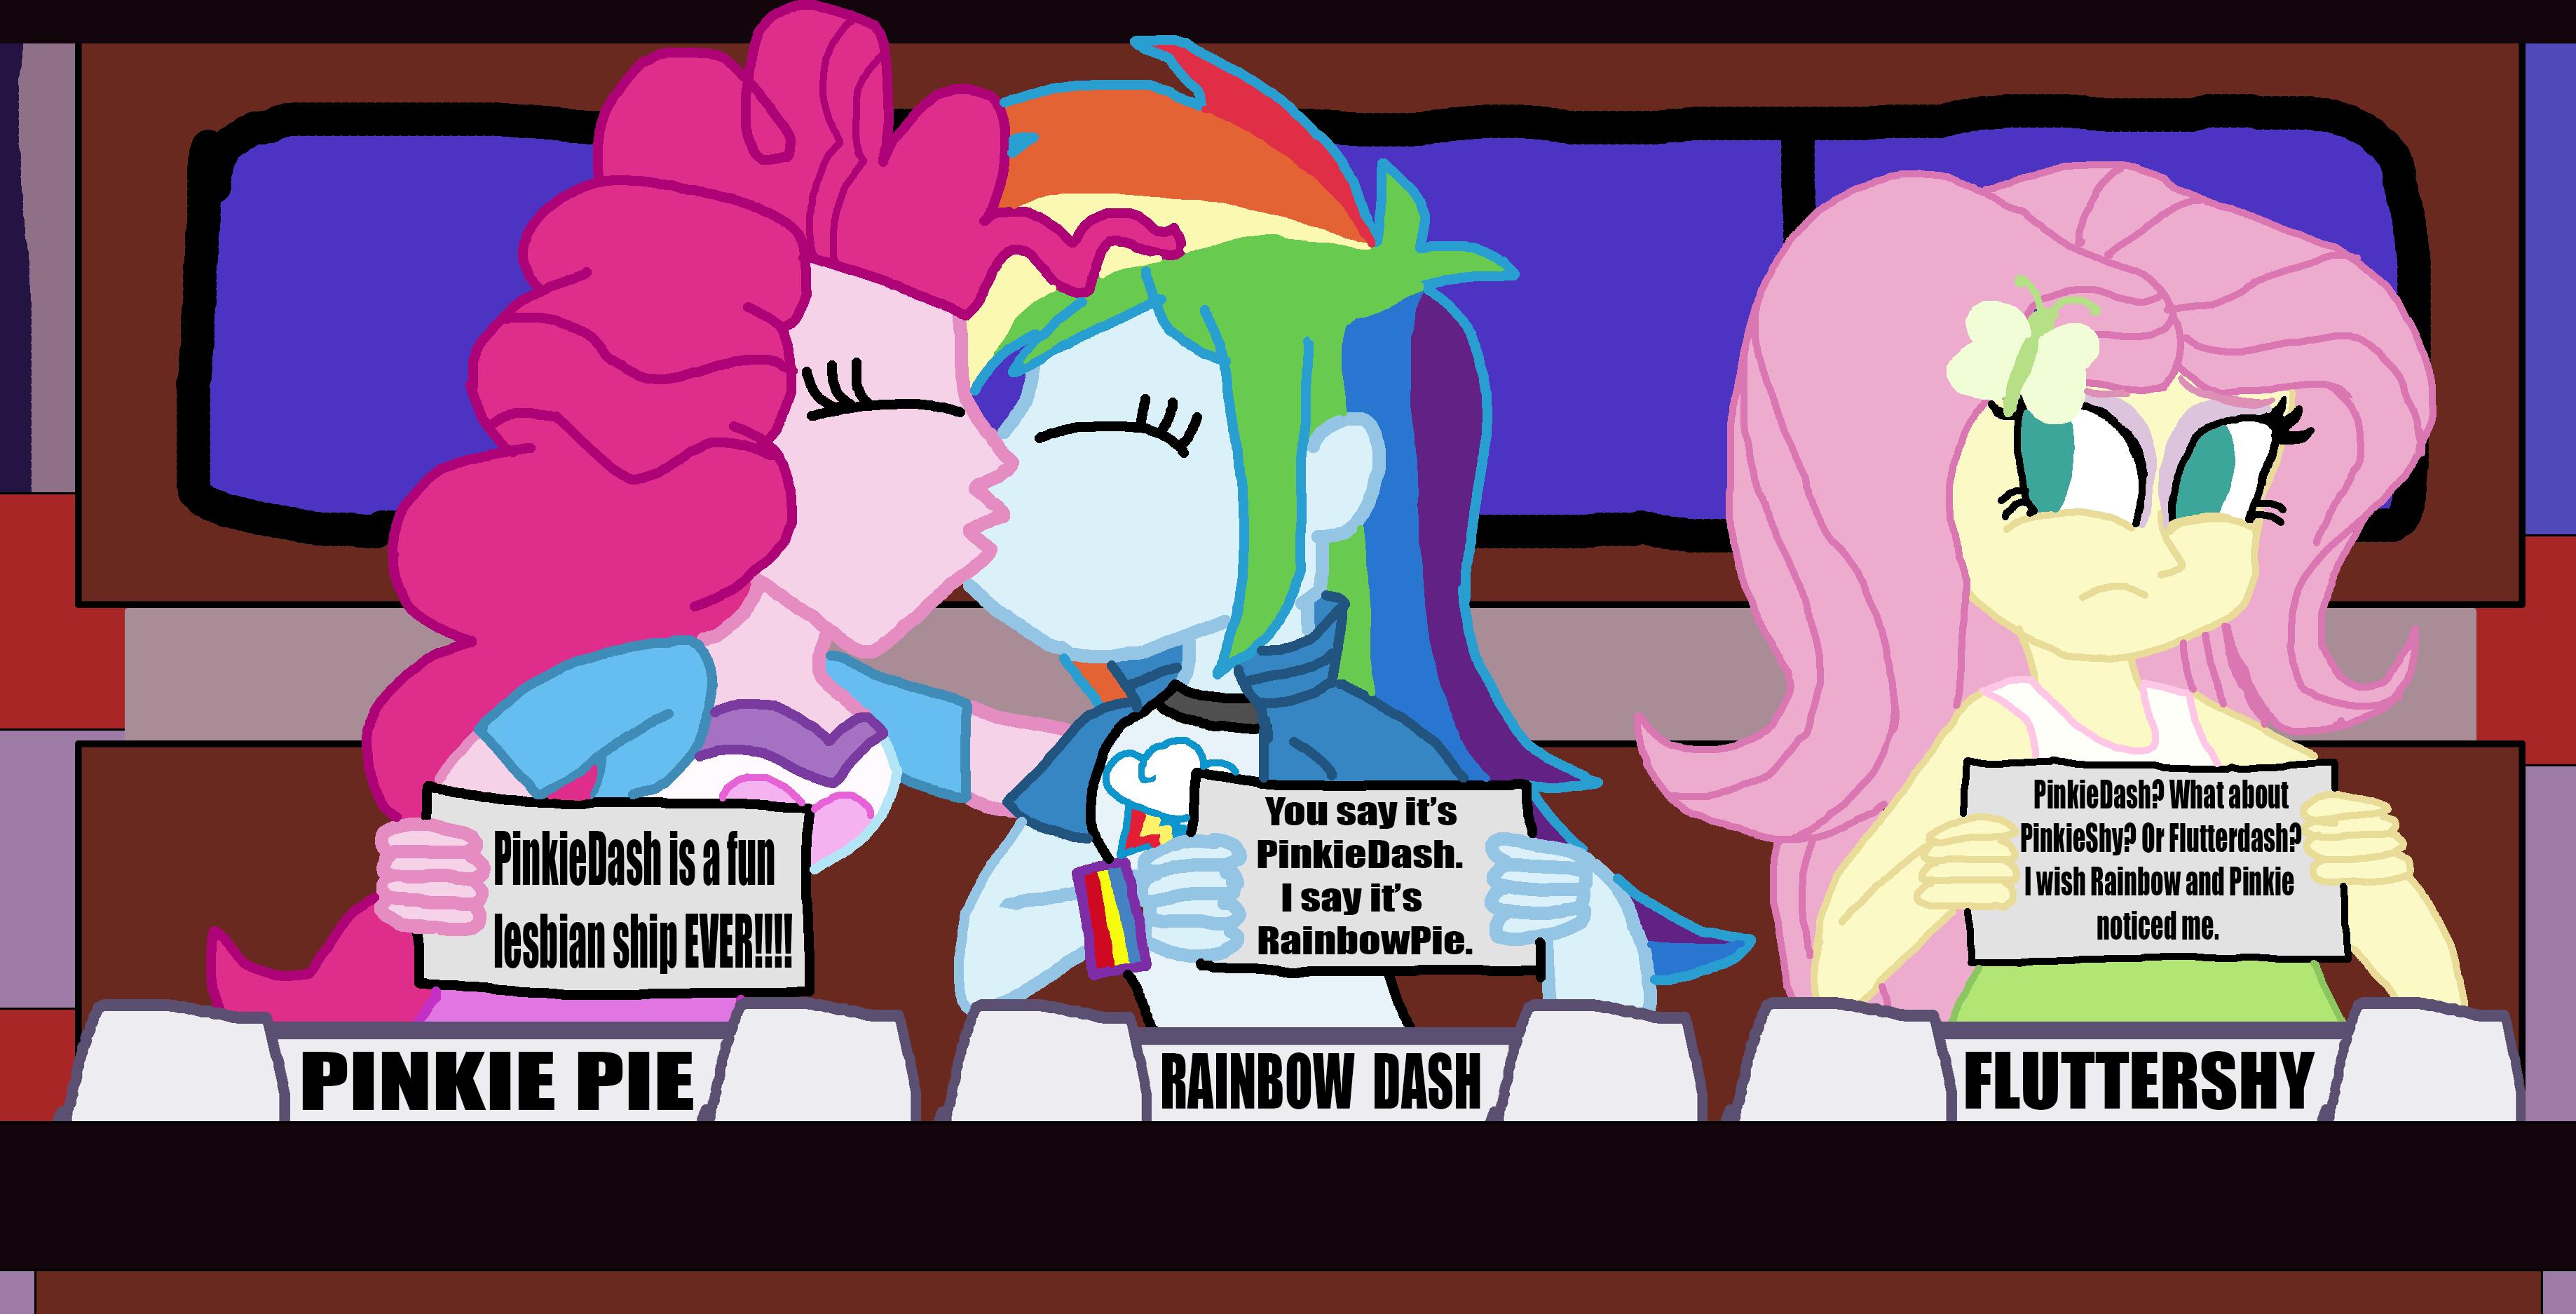 - Fluttershy, Pinkie Pie, Rainbow Dash On Match Game By KTd1993 On